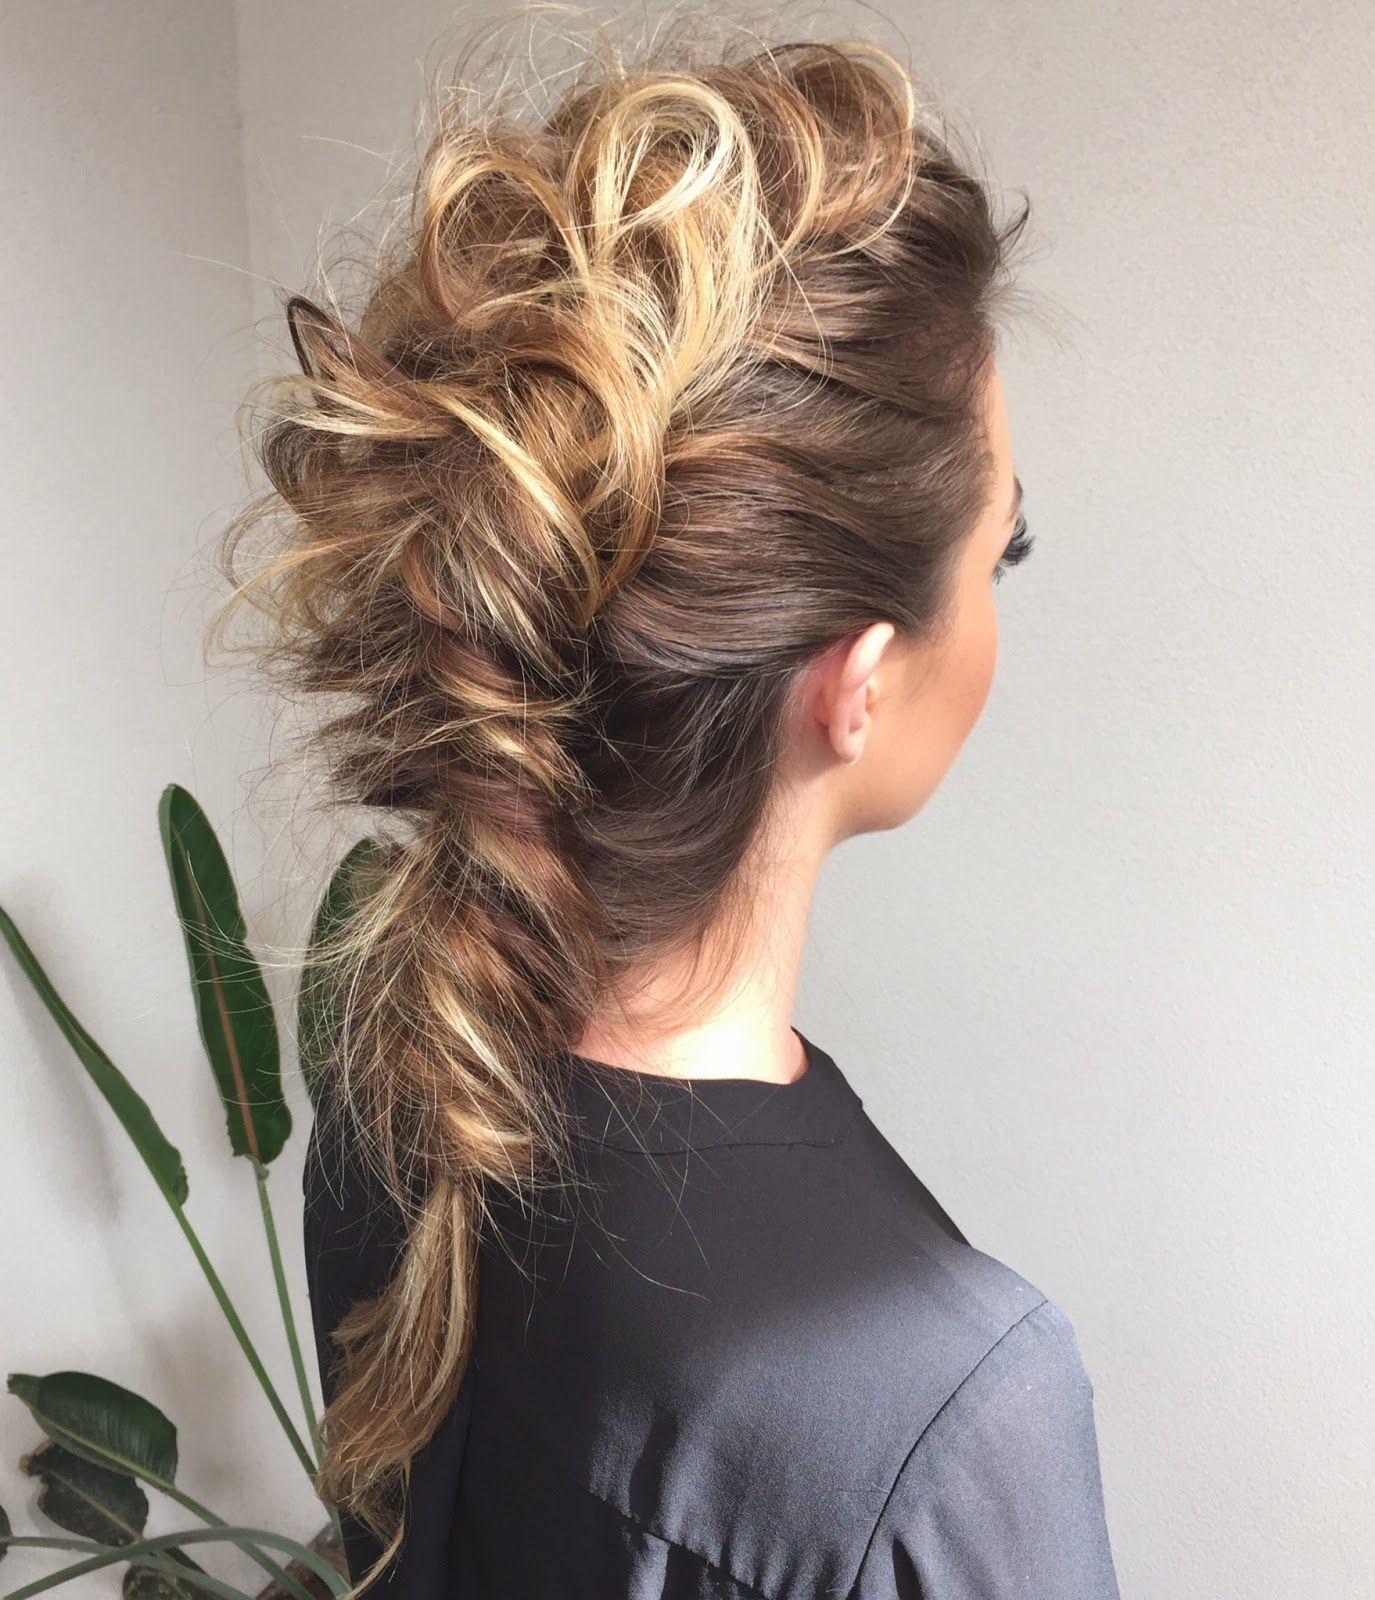 Womensbraid braids messyhair visit jatai for beauty